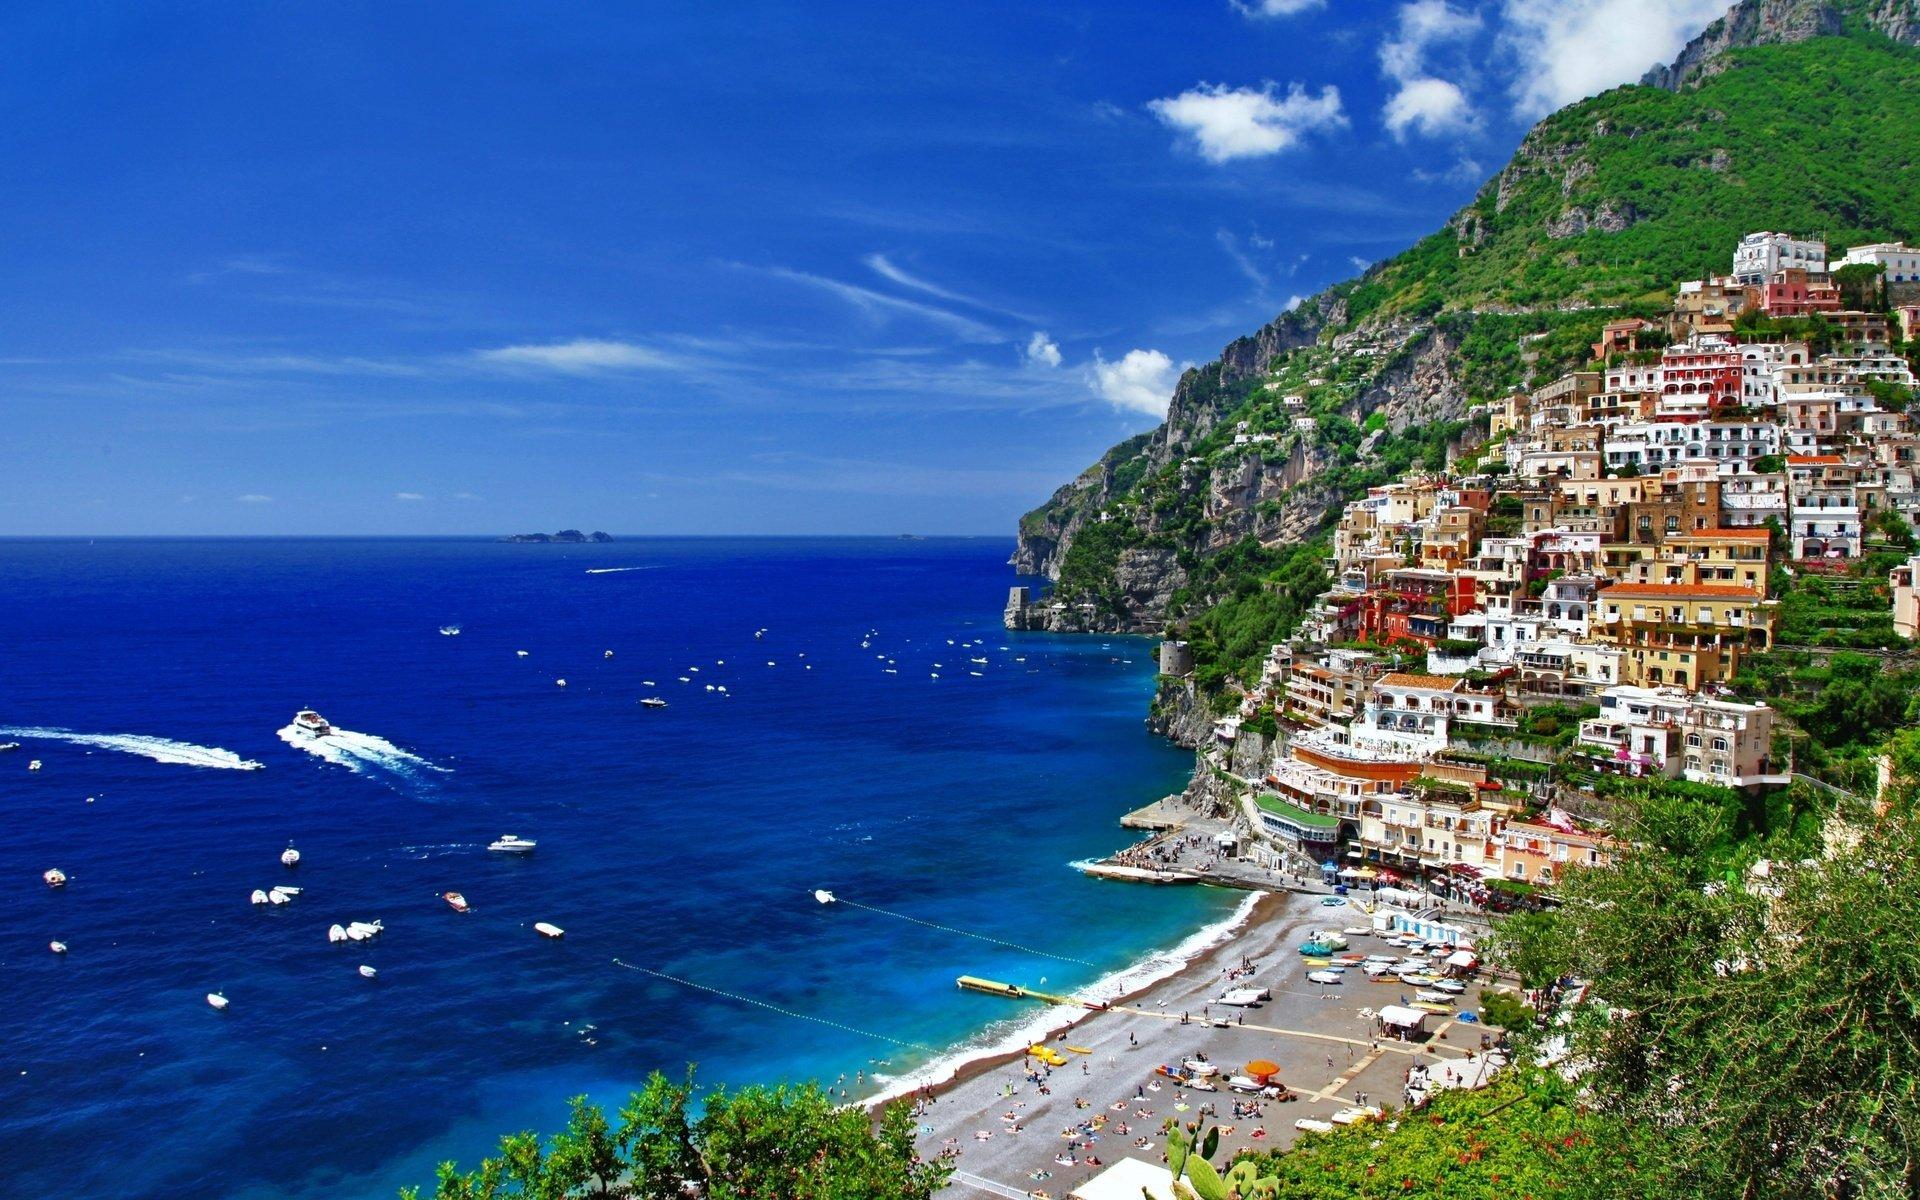 Photography - Scenic  Resort Italy Tropical Ship Boat Sea Ocean Villa Village Town Positano Cliff City Sky Cloud Wallpaper